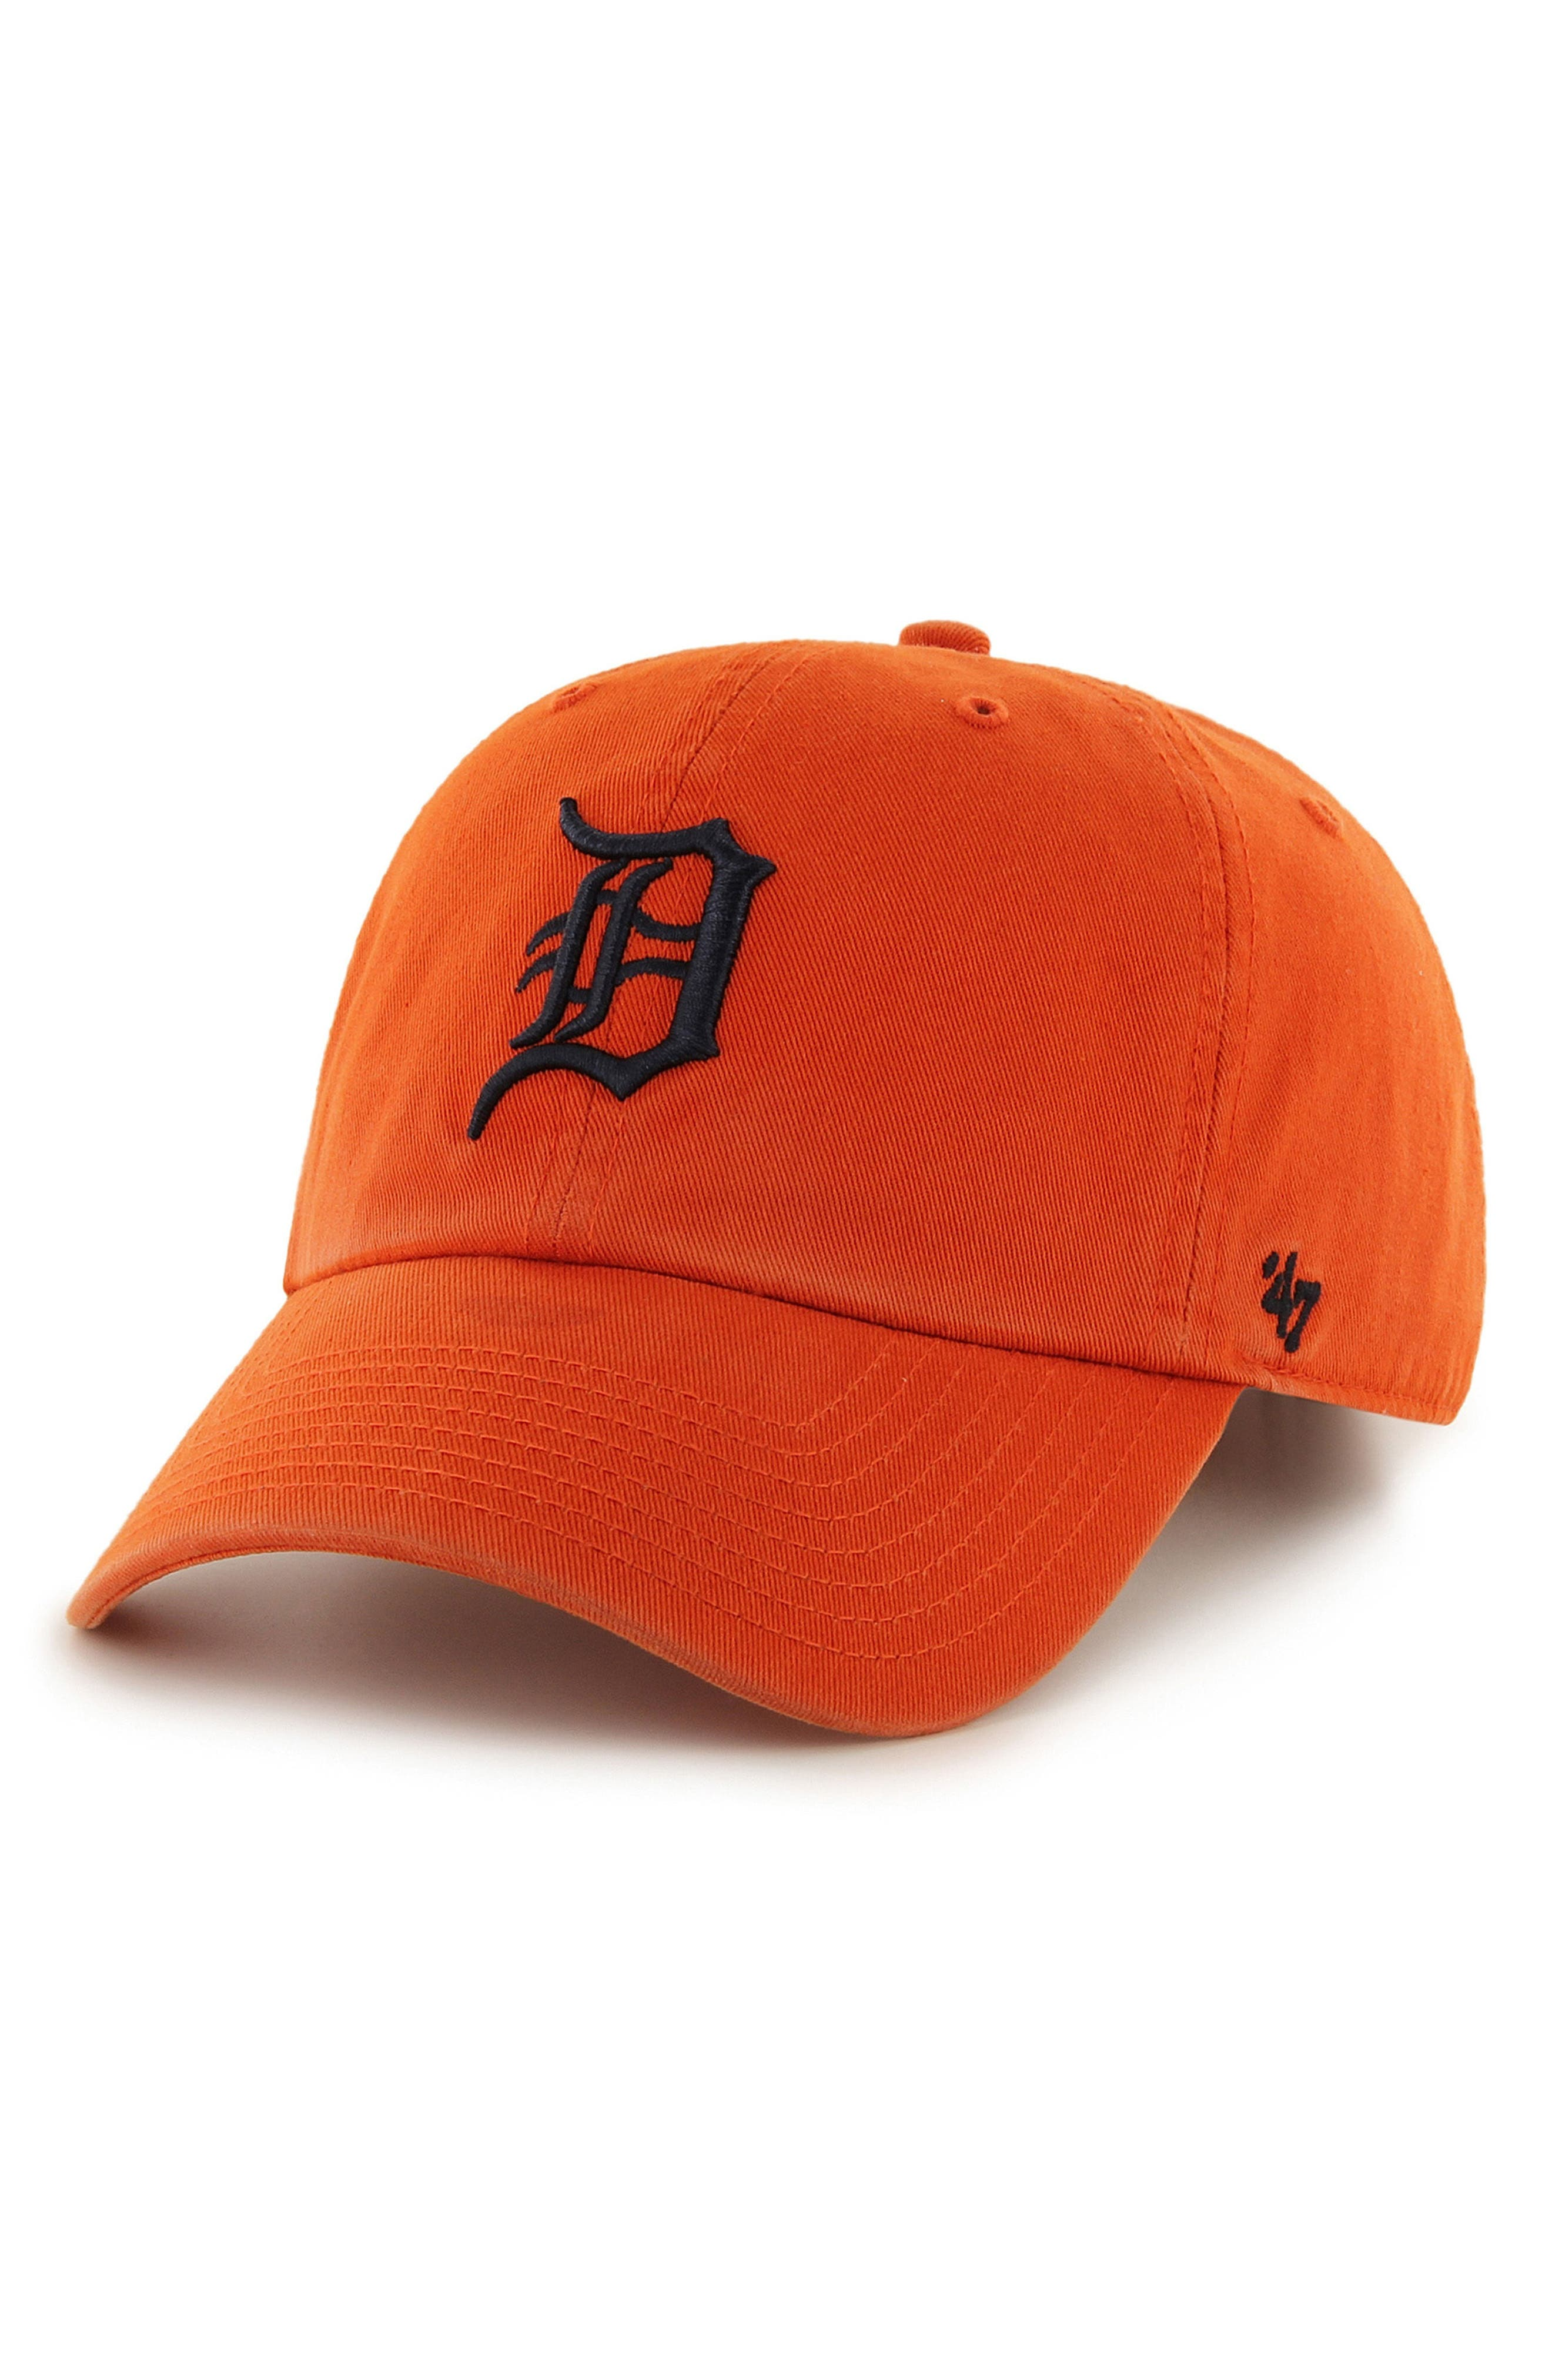 '47 MLB Ball Cap